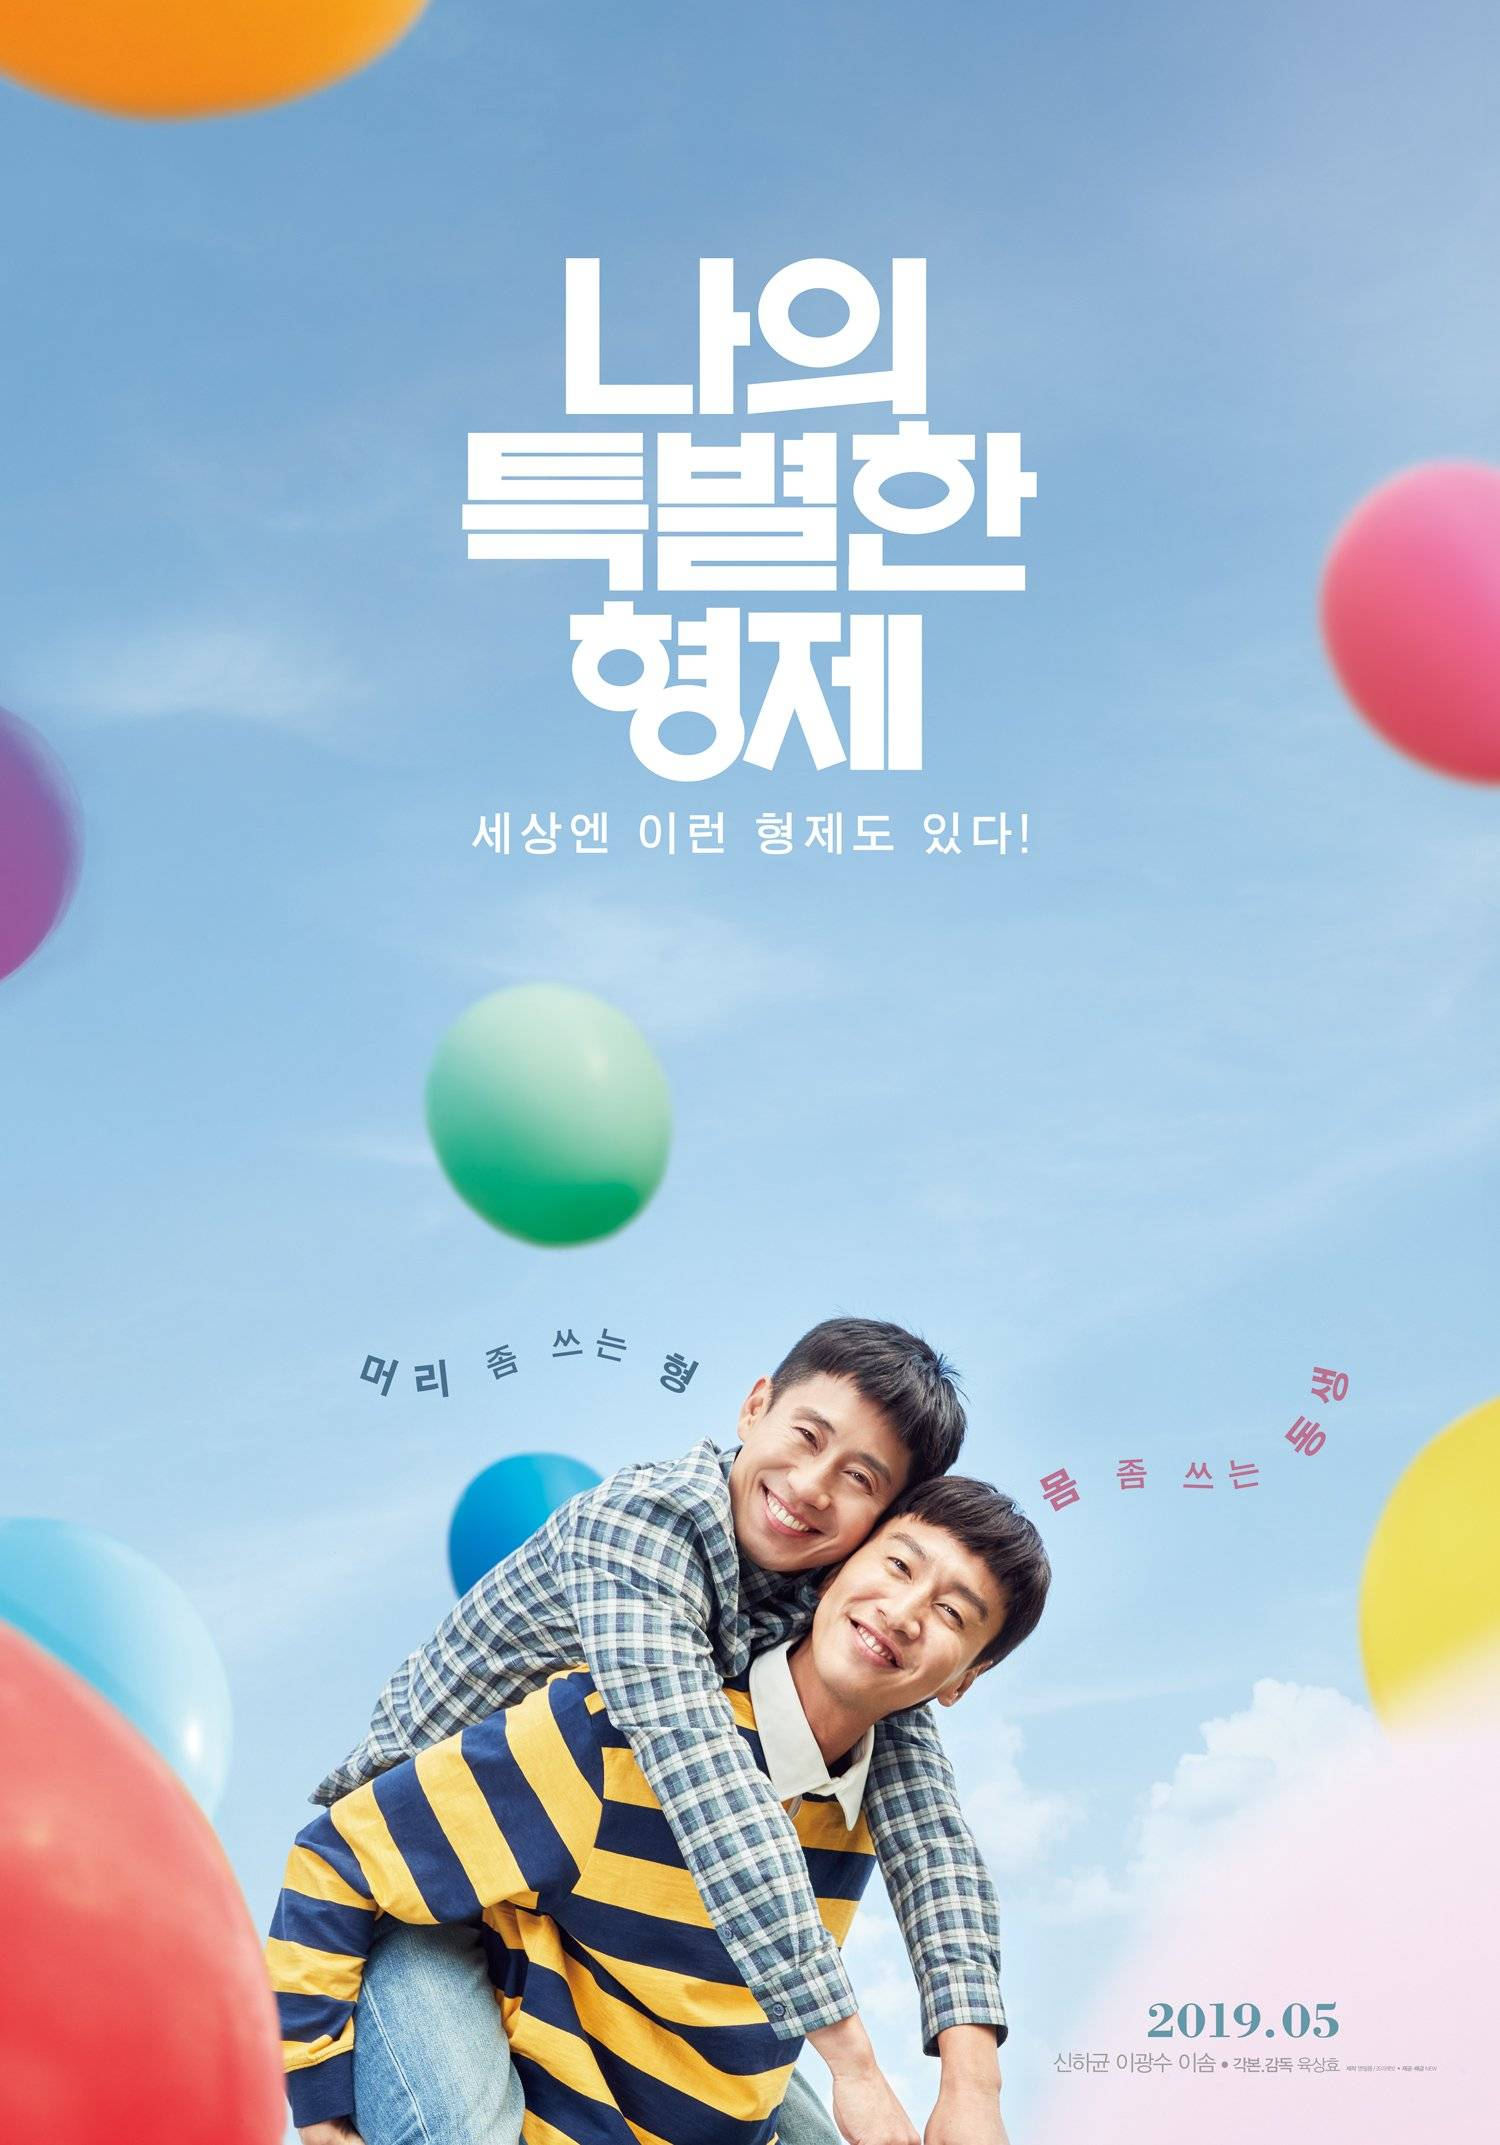 Inseparable Bros (Korean Movie - 2018) - 나의 특별한 형제